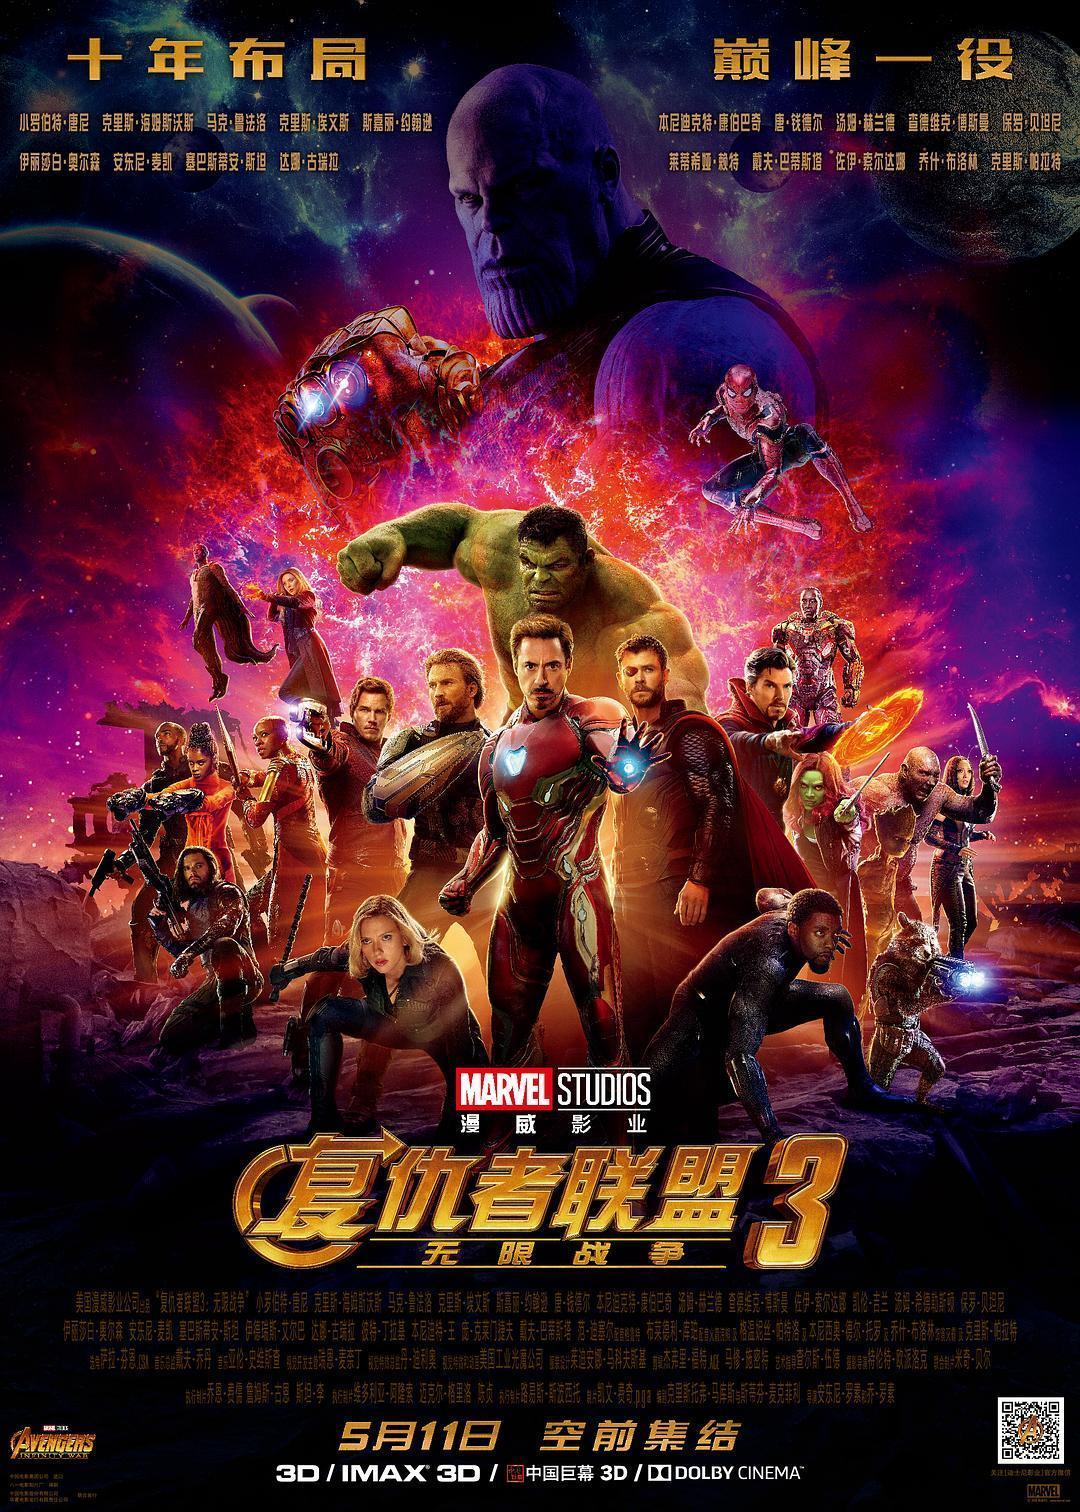 复仇者联盟3:无限战争 Avengers: Infinity War